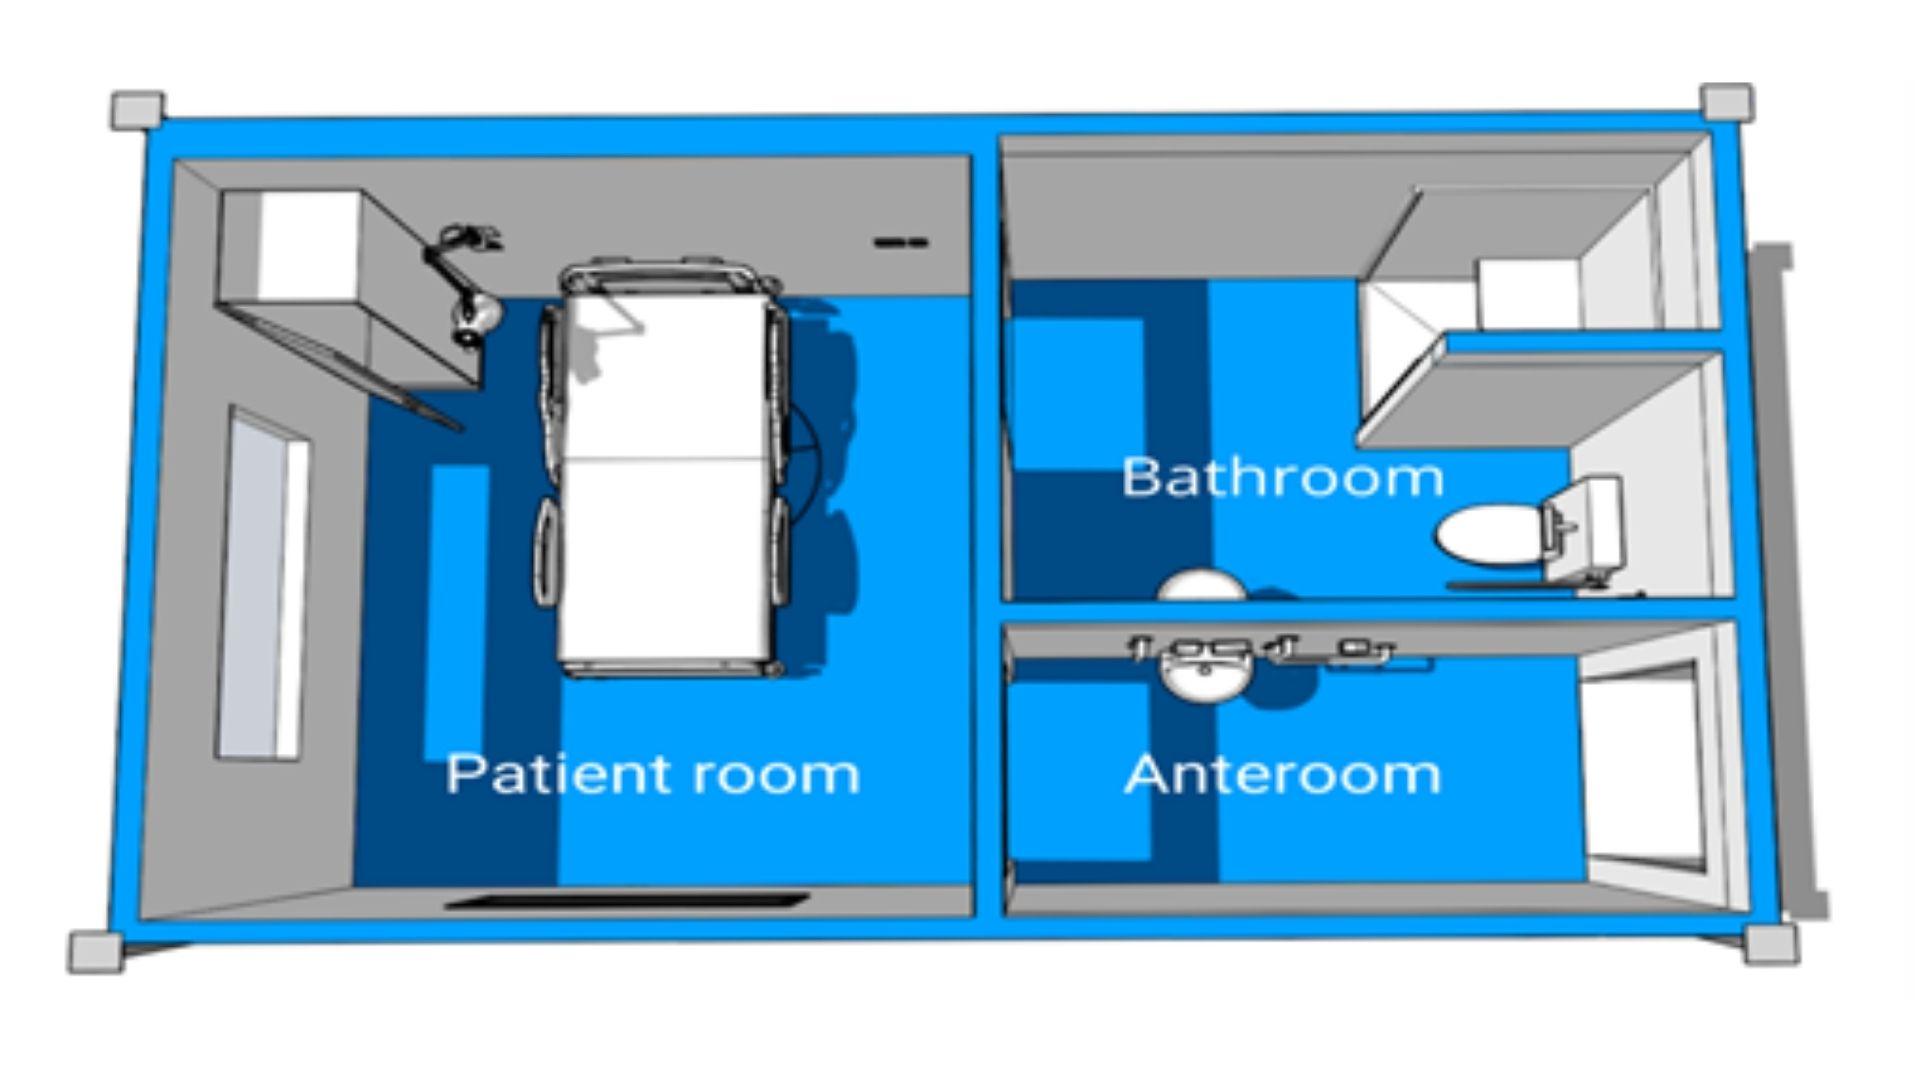 Prefab Hospital - Modular Hospital room